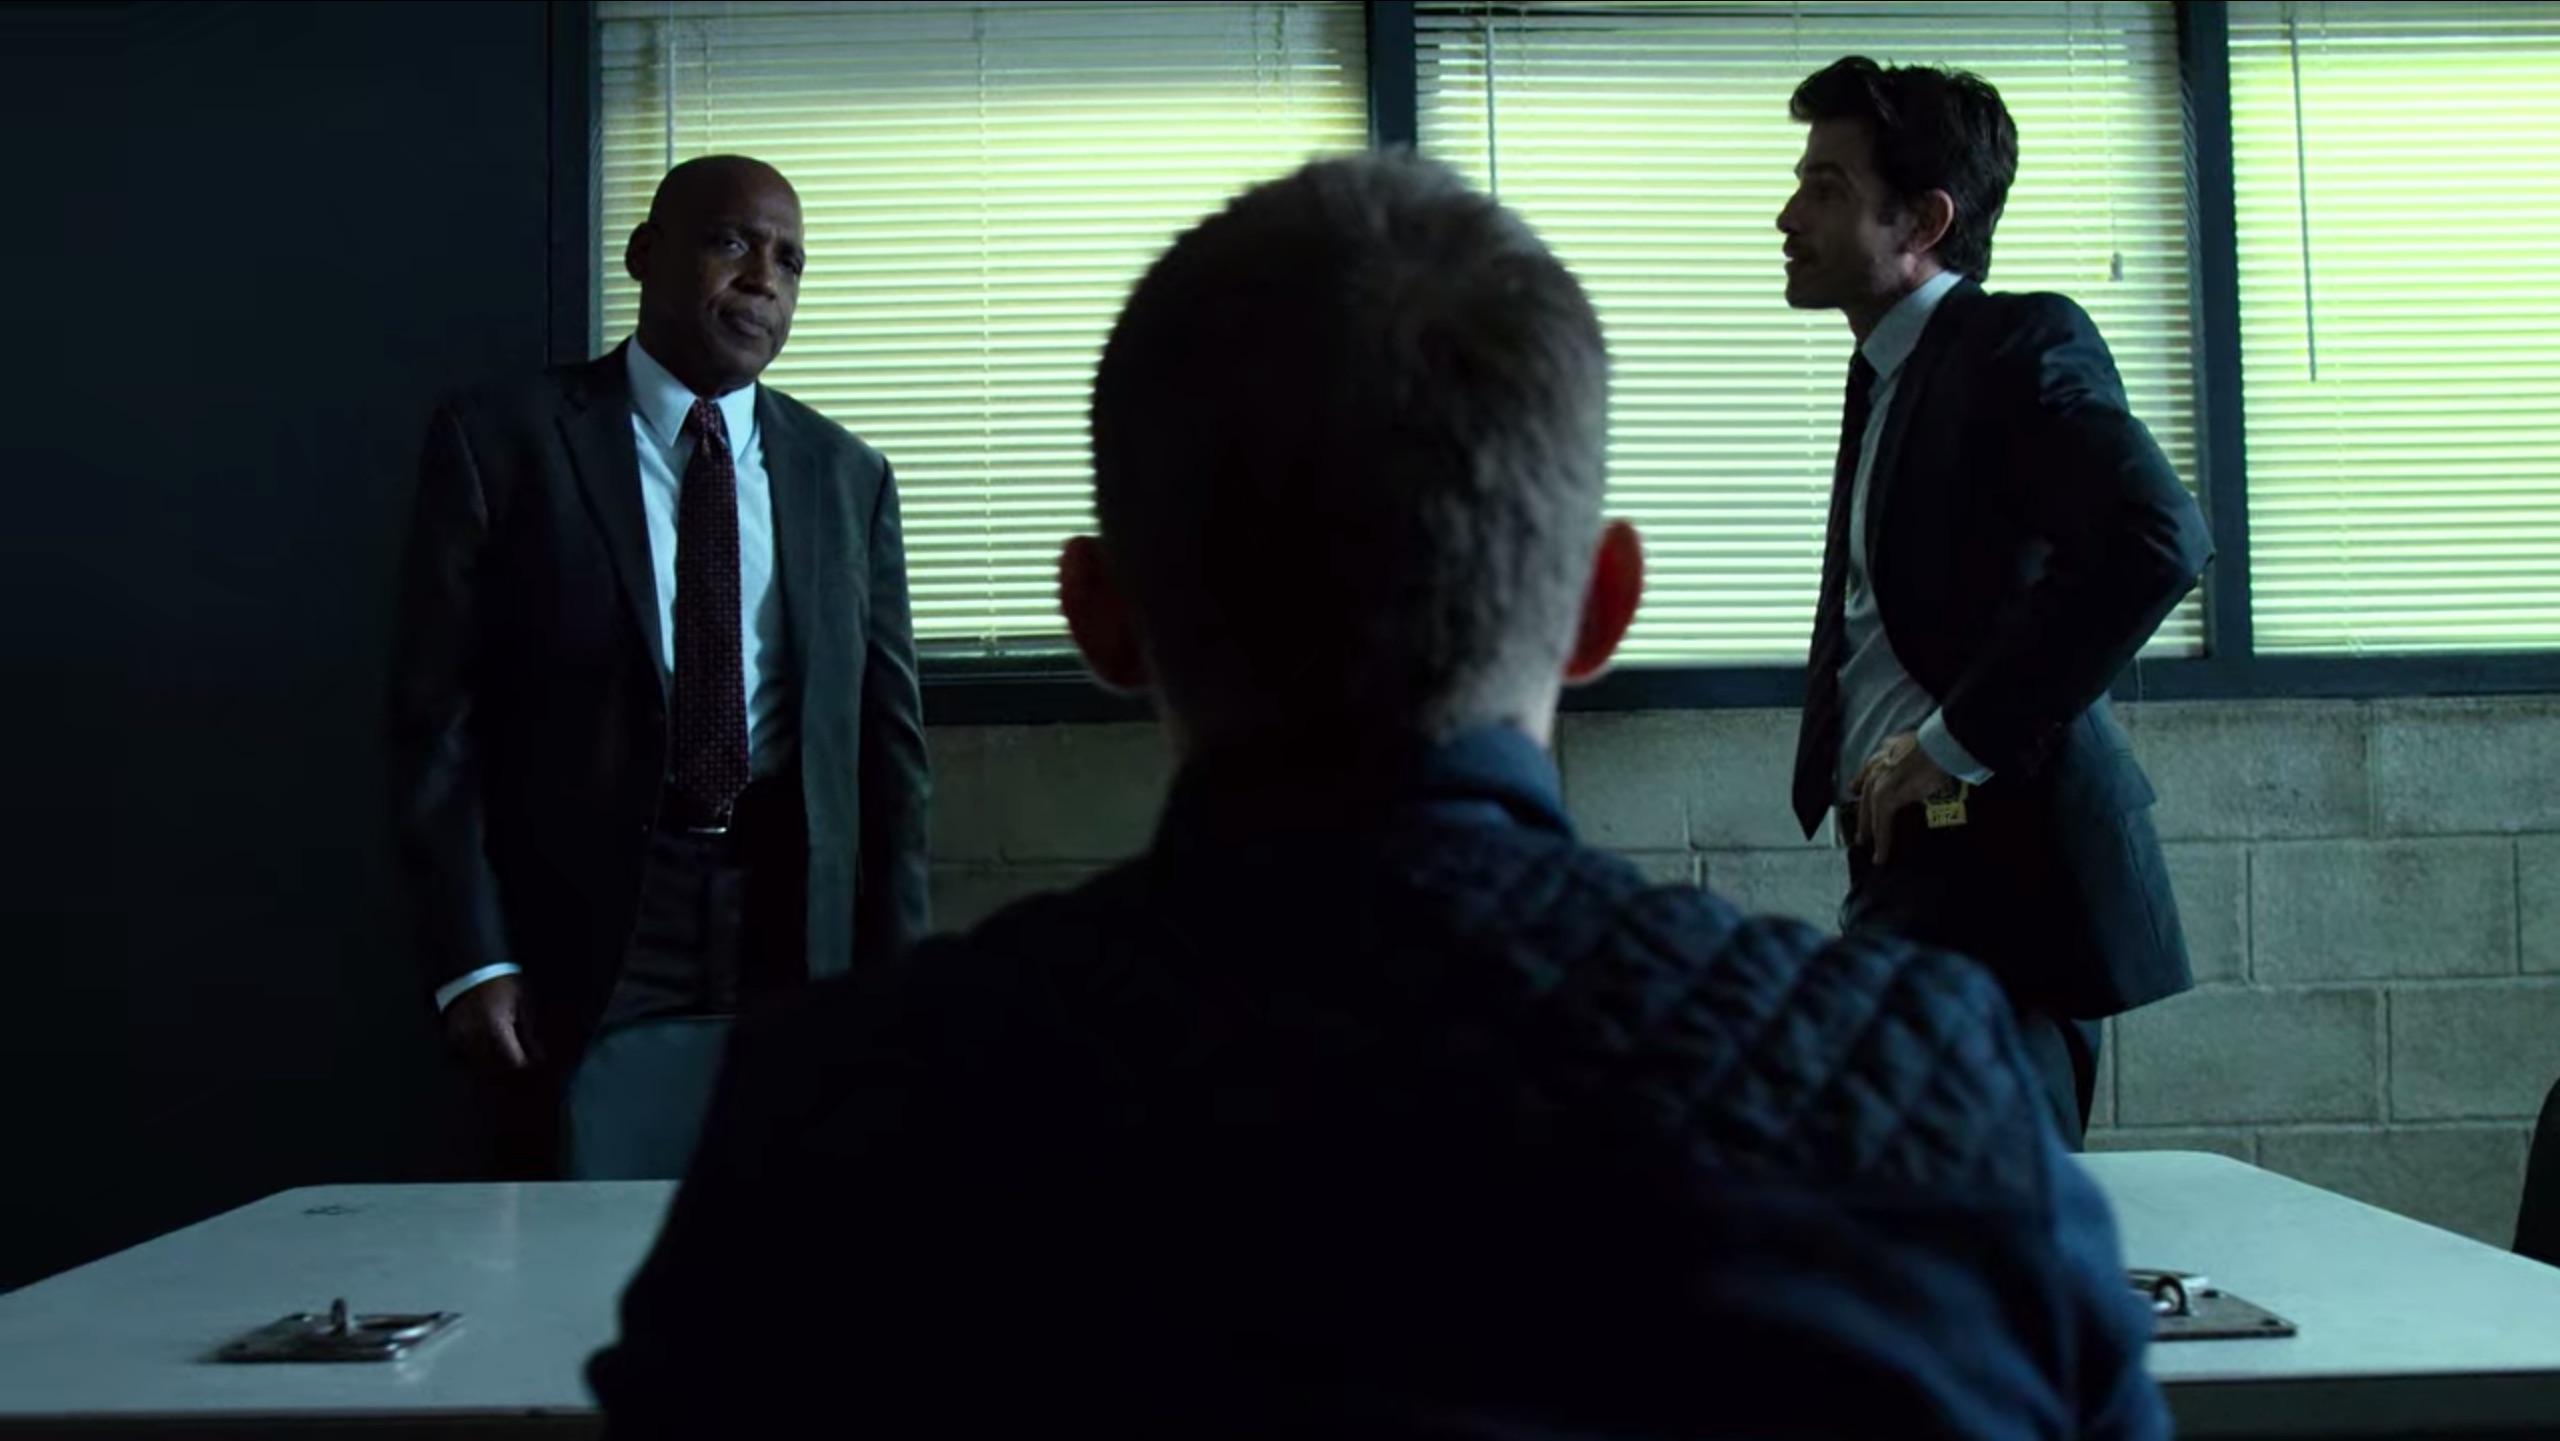 File:File 03-DDRedthread -Detective Blake -Detective Hoffman -The Russians.jpg